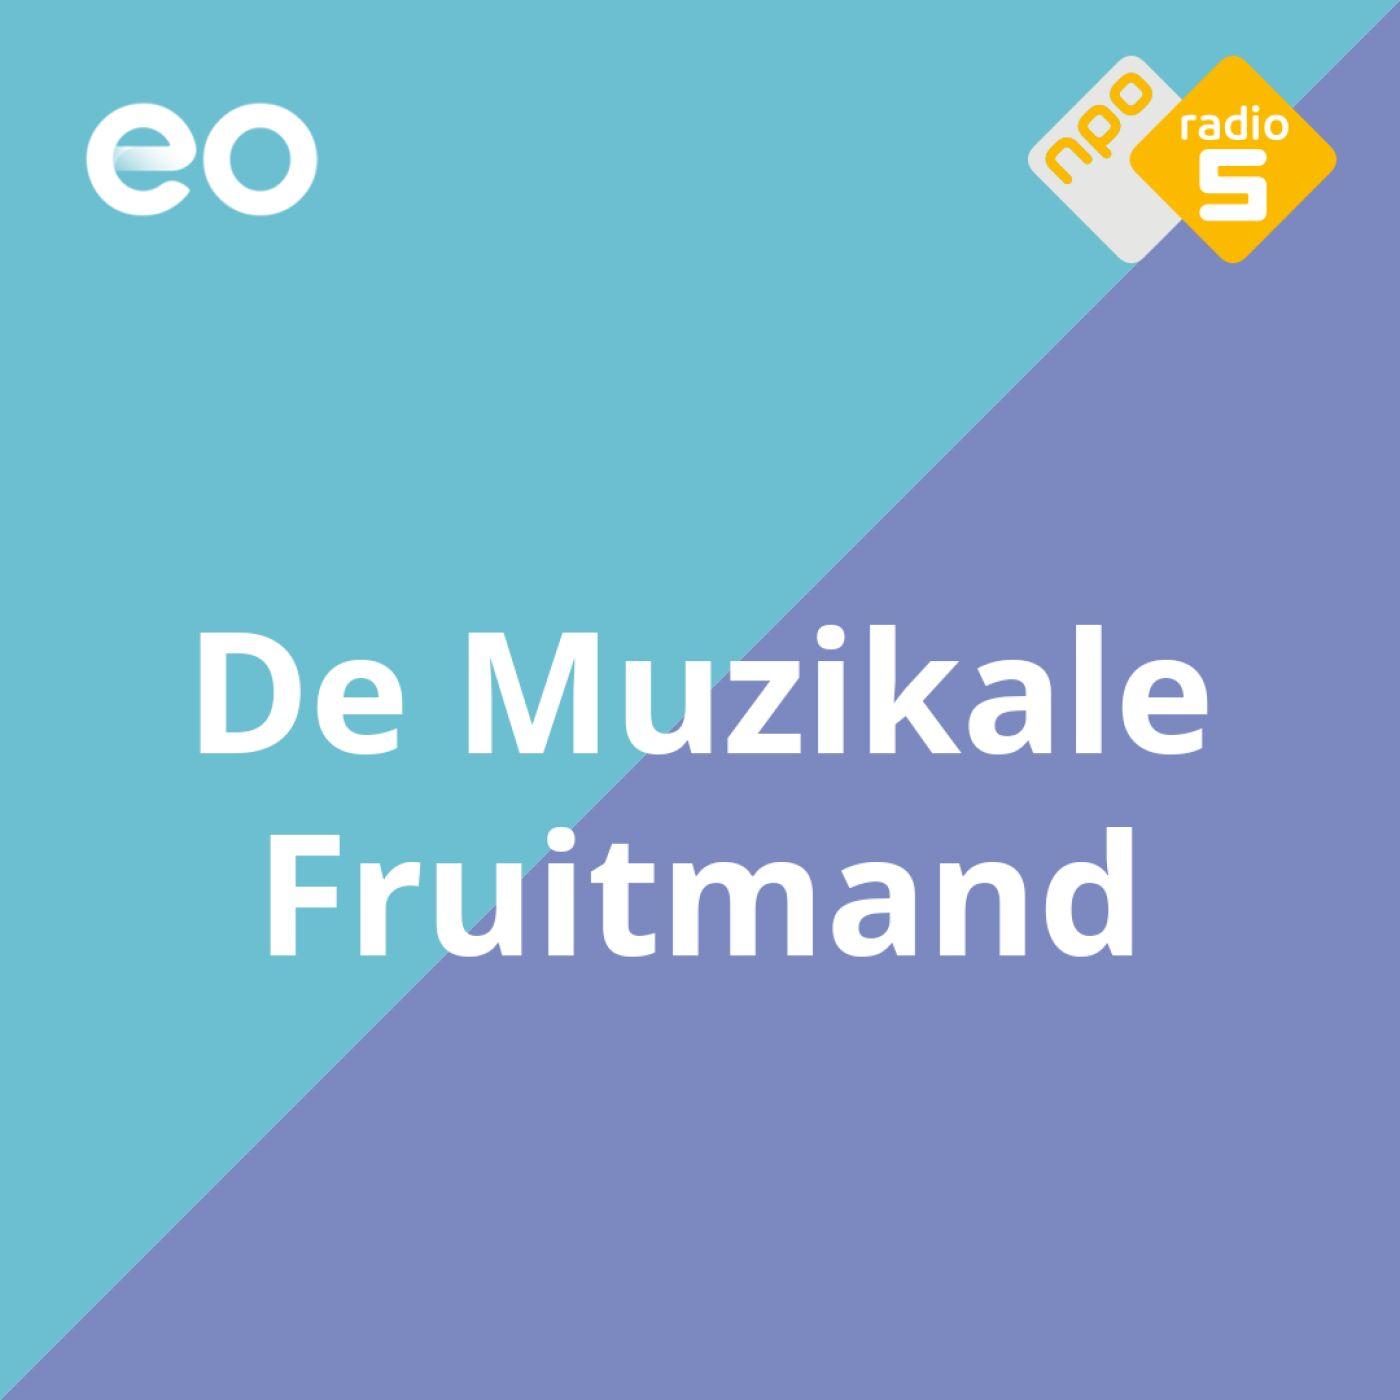 De Muzikale Fruitmand logo